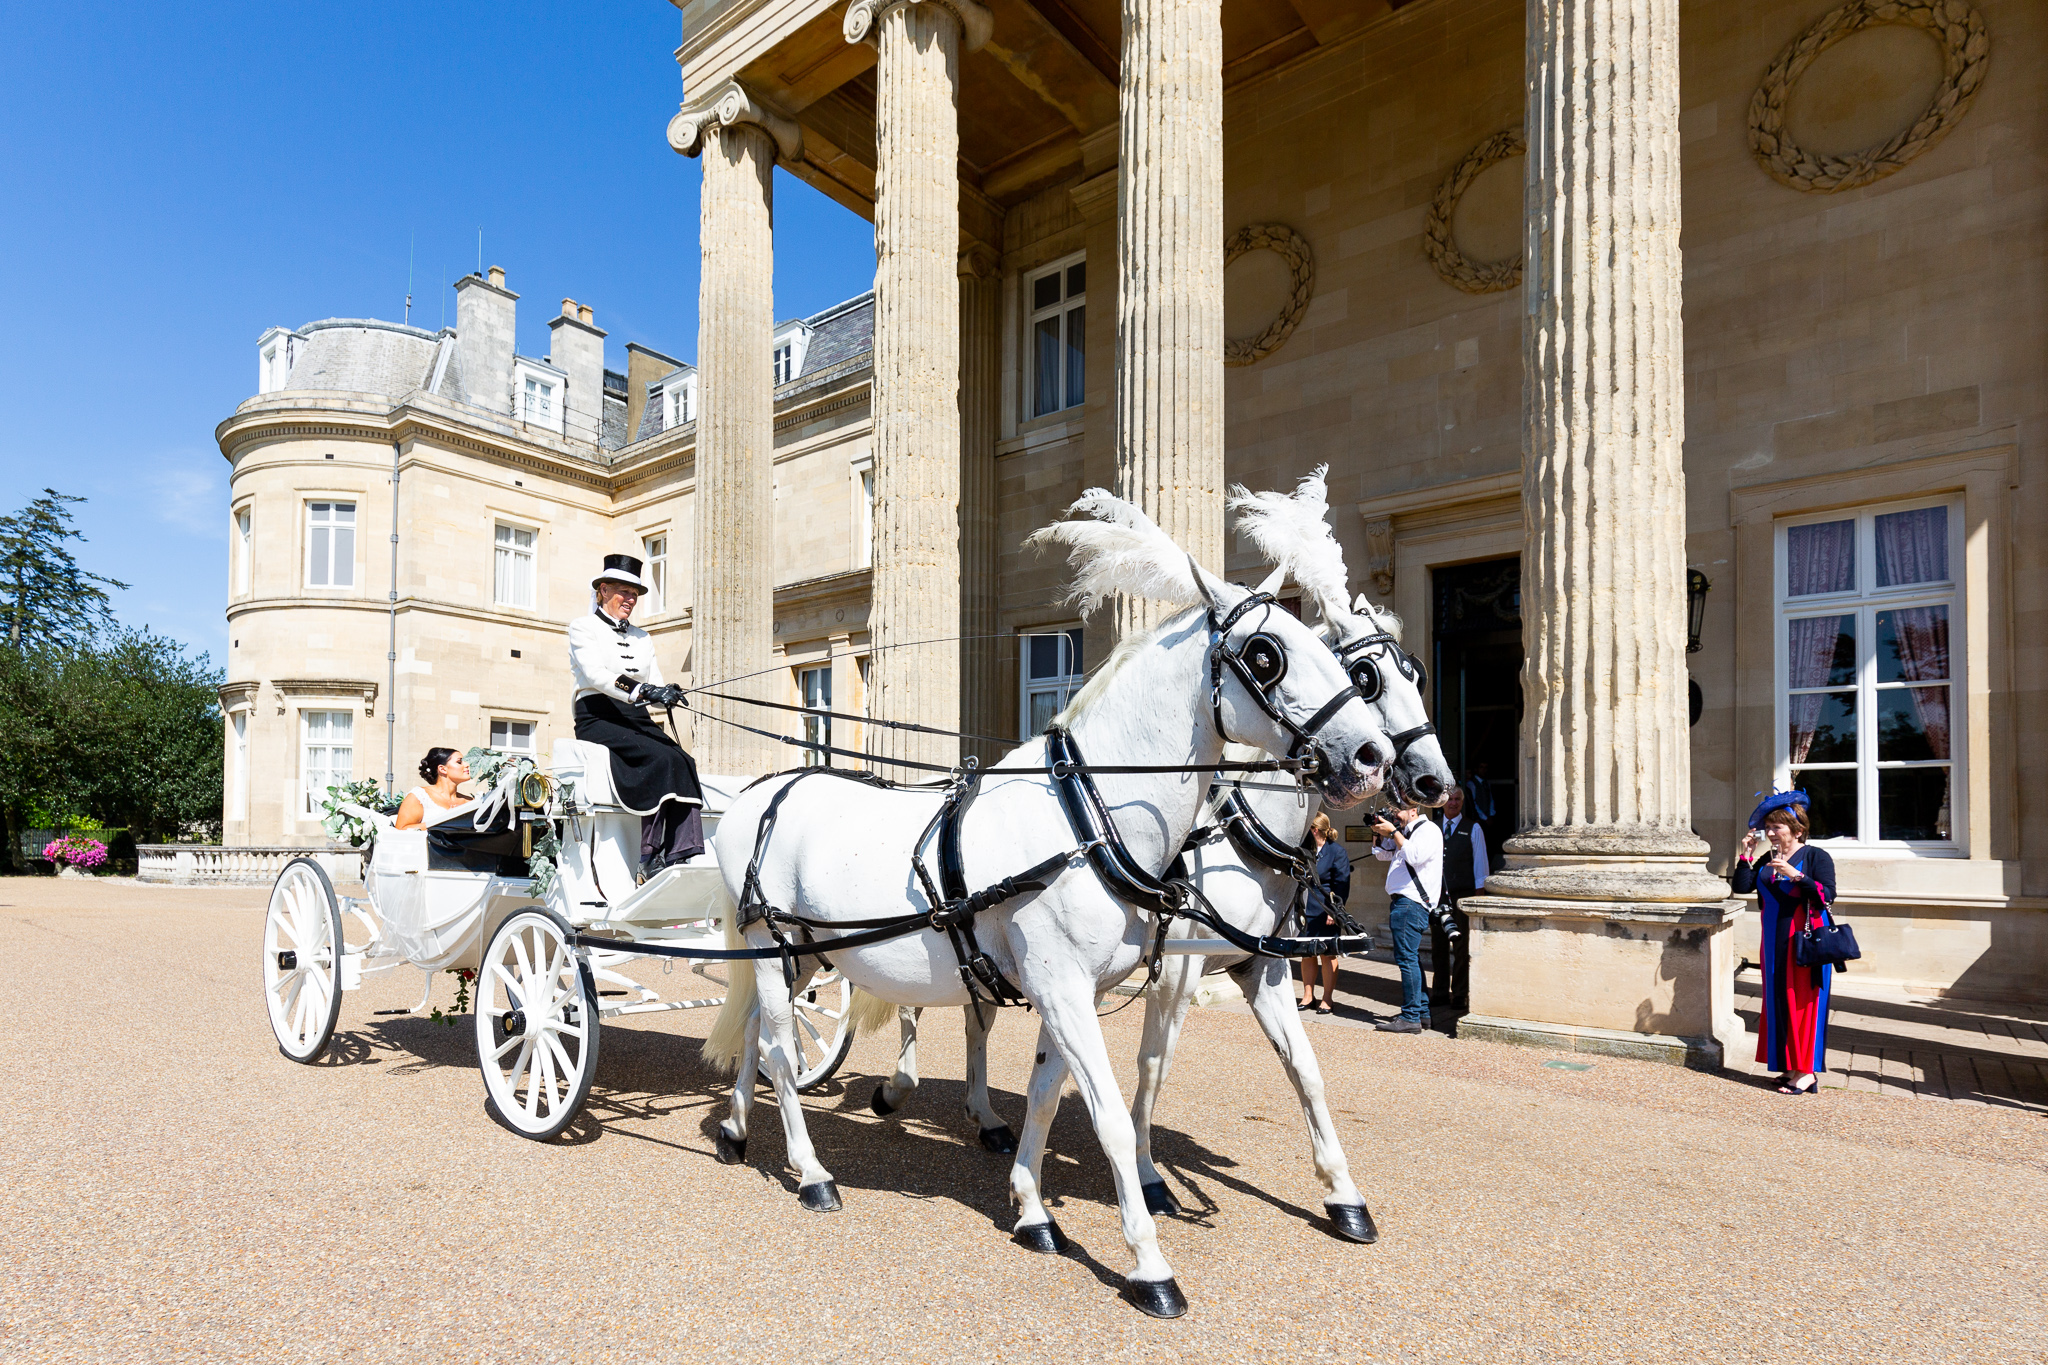 Horse_carriage_wedding_arrival_natural_wedding_photography_Rachel_Thornhill_Photographer